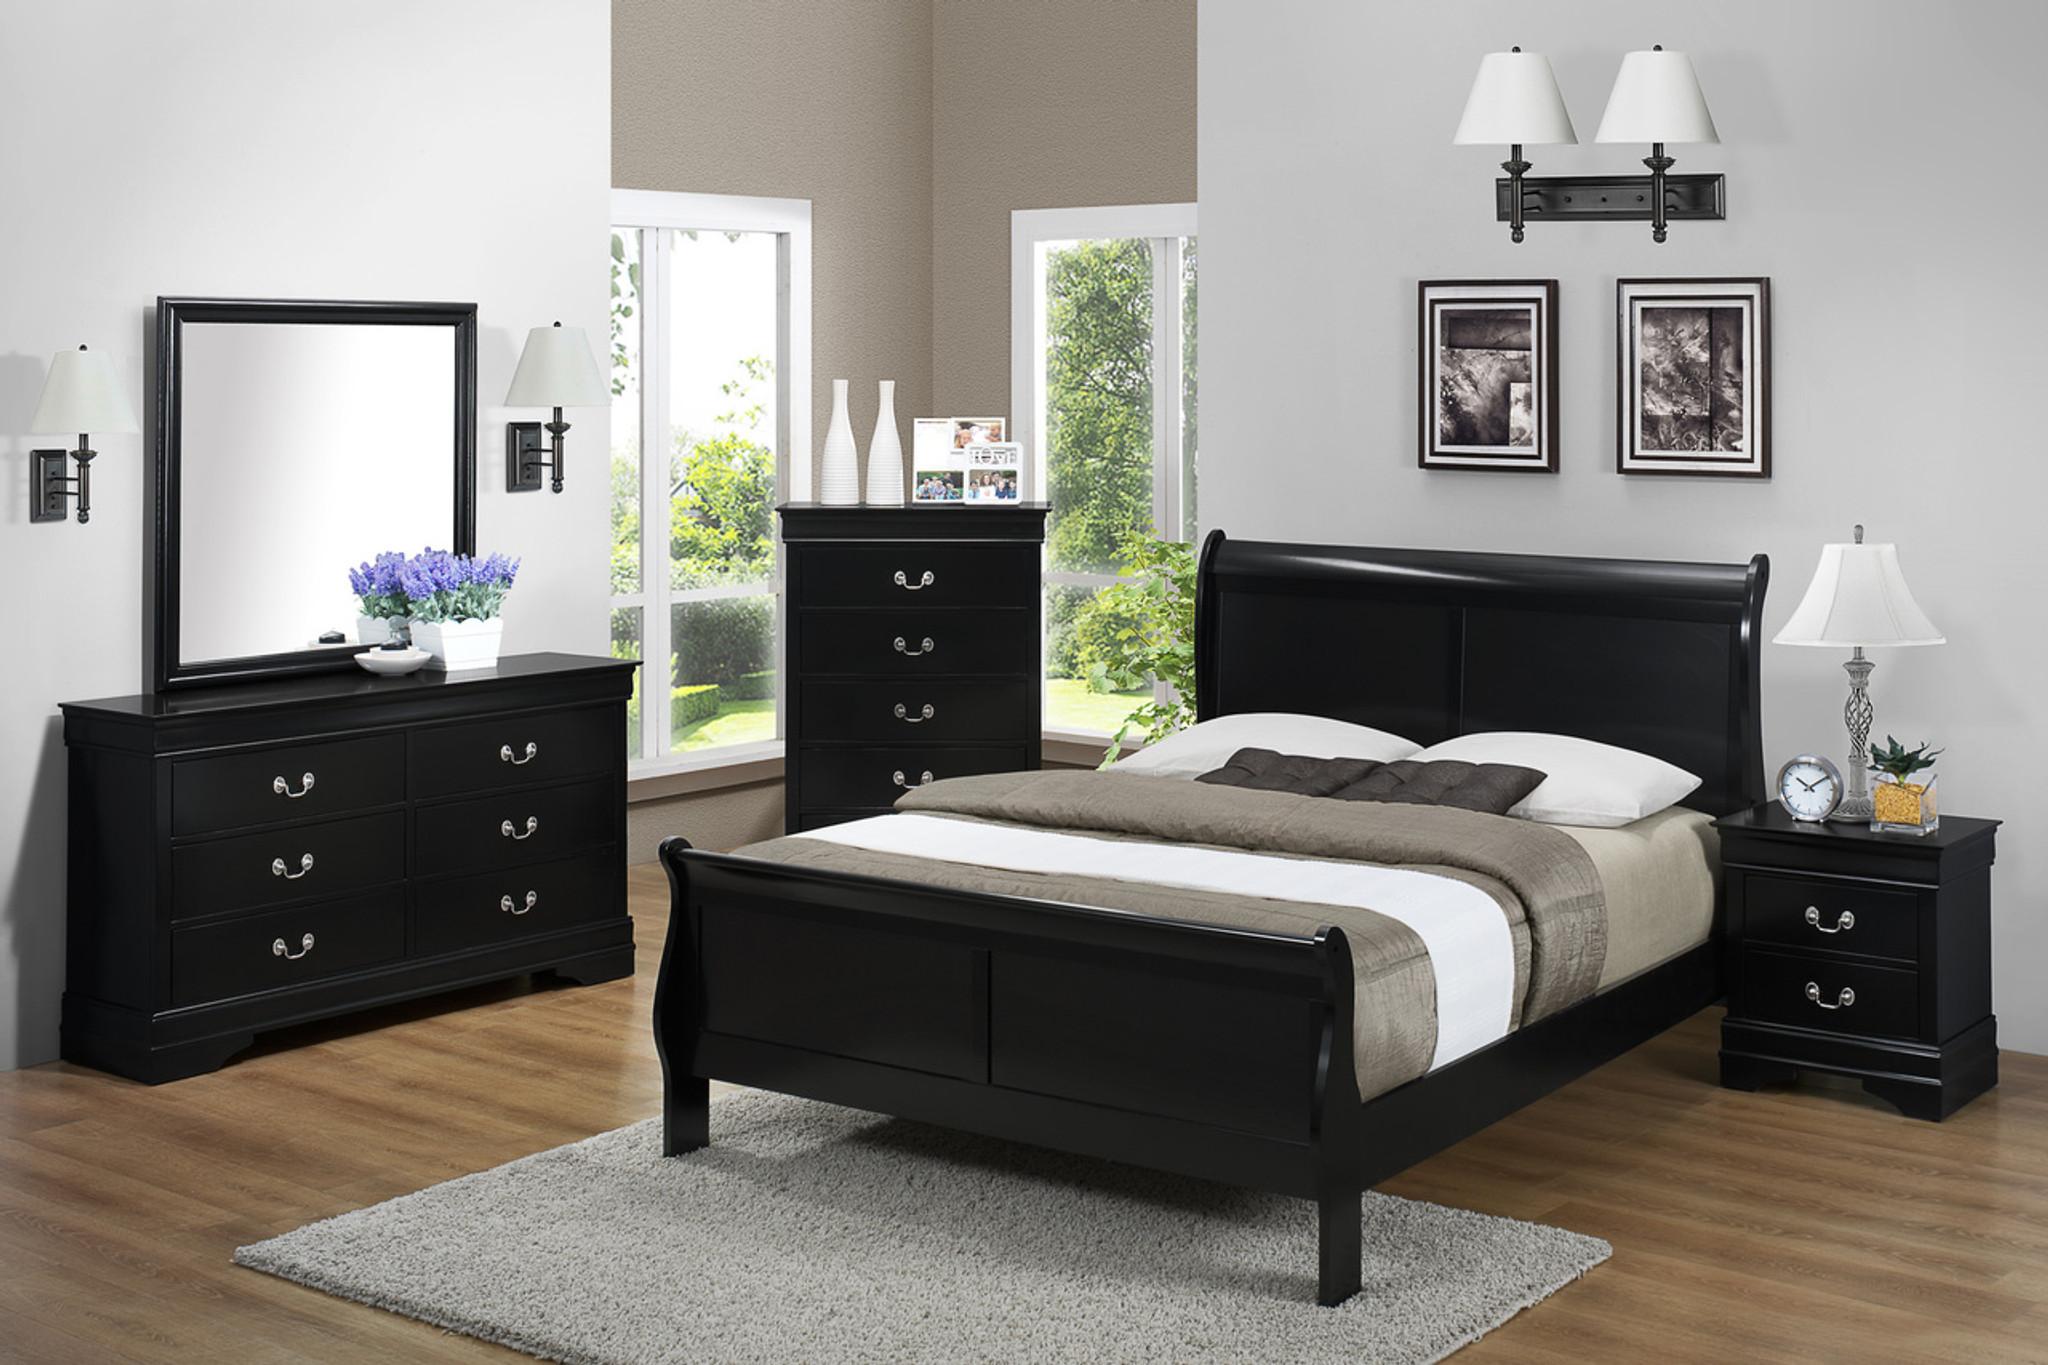 7pcs Louis Phillip Bedroom Set In Black Km Home Furniture Mattress